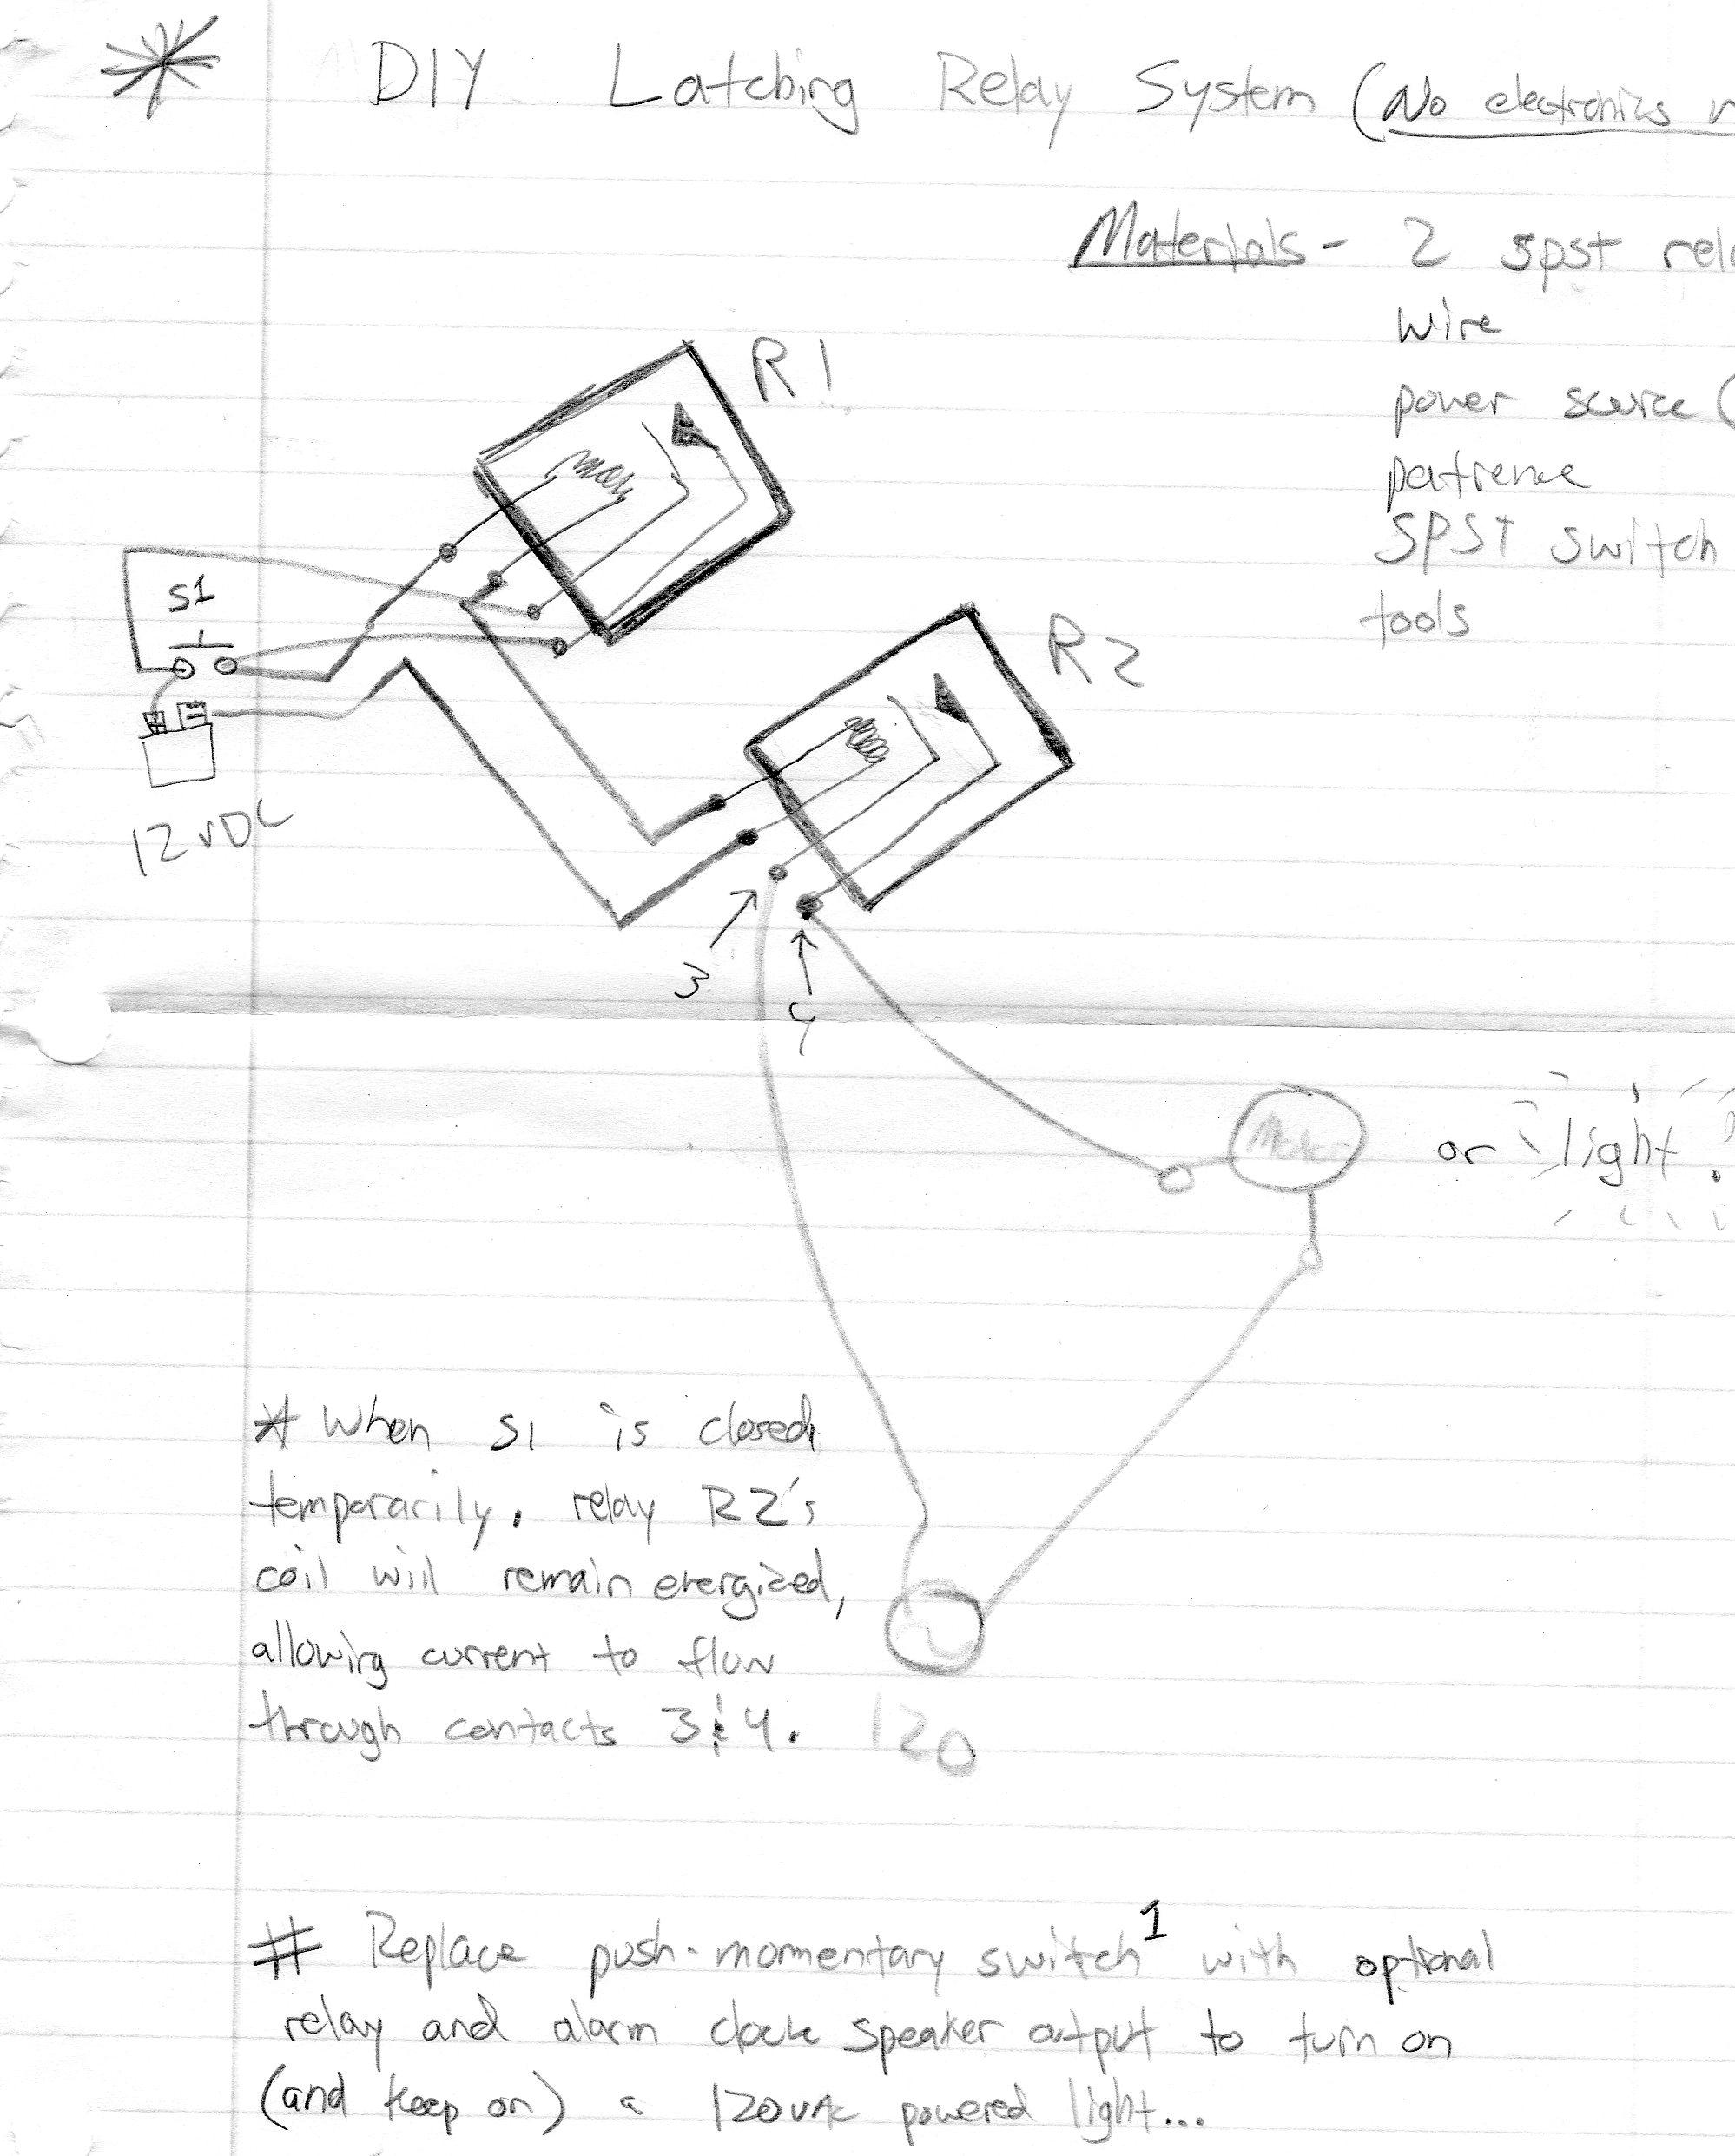 momentary relay diagram [ 1998 x 2483 Pixel ]